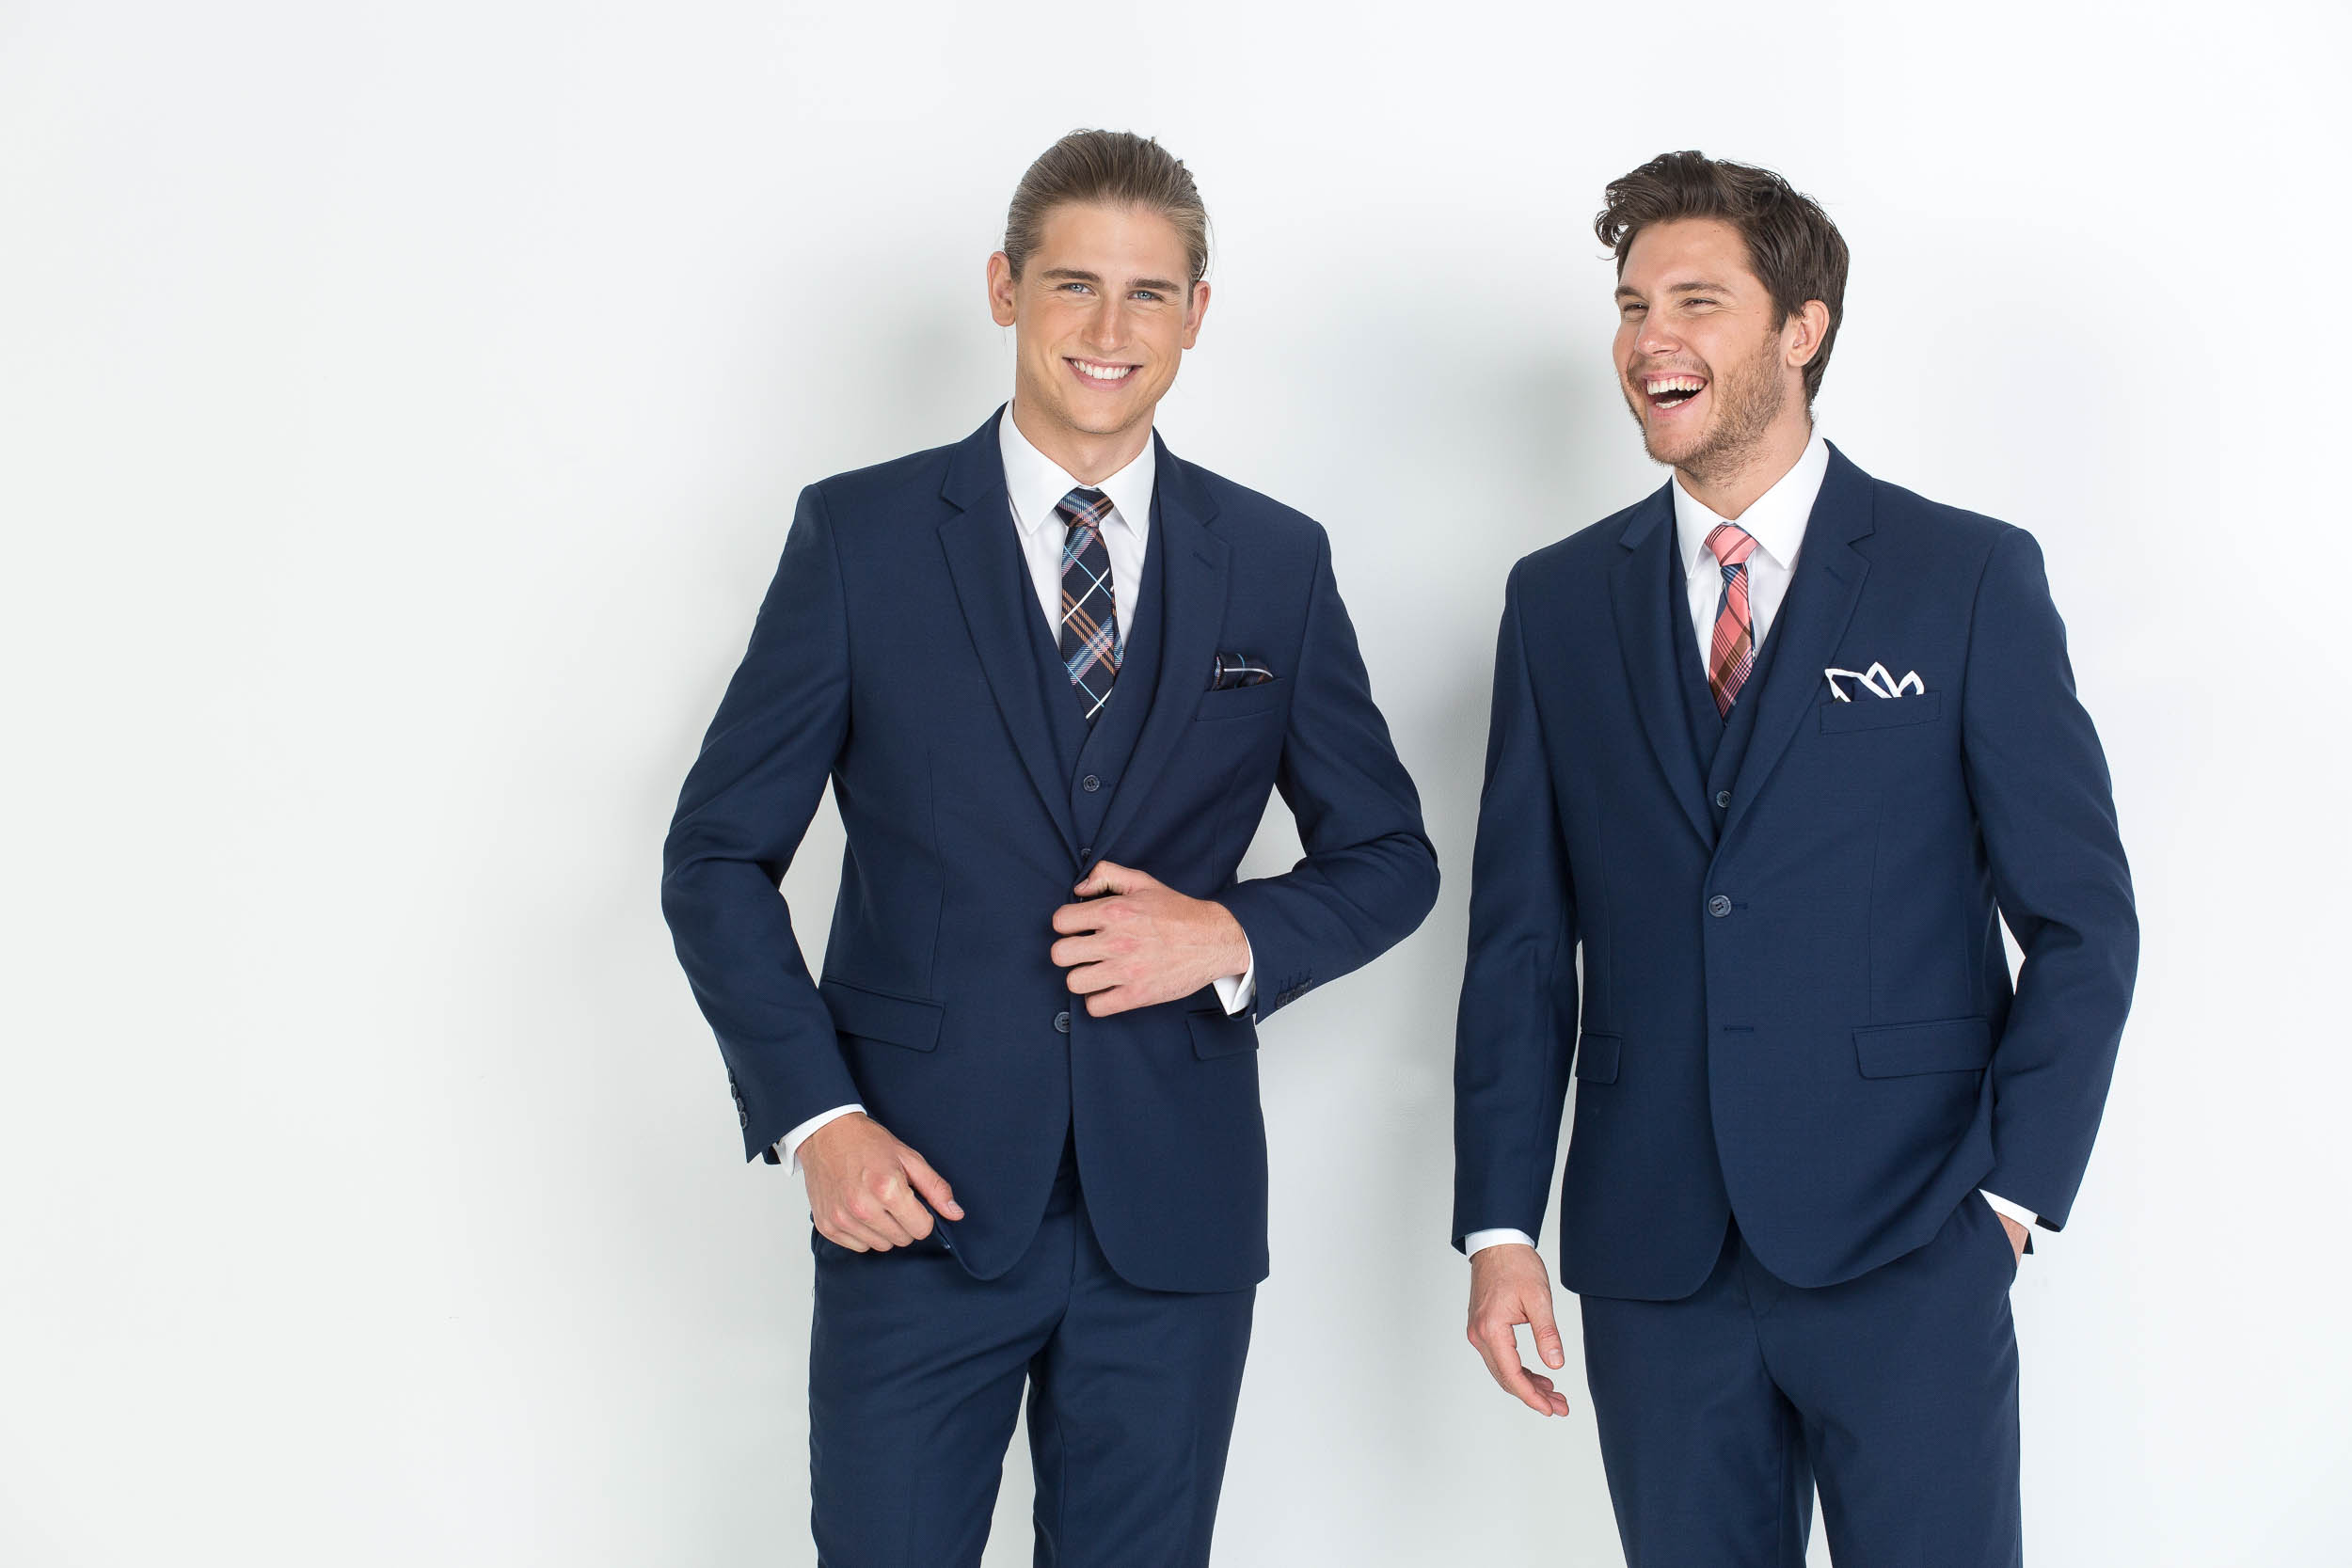 Commercial Mens Fashion Photography by Nick Walters for Ferrari Formalwear5.jpg